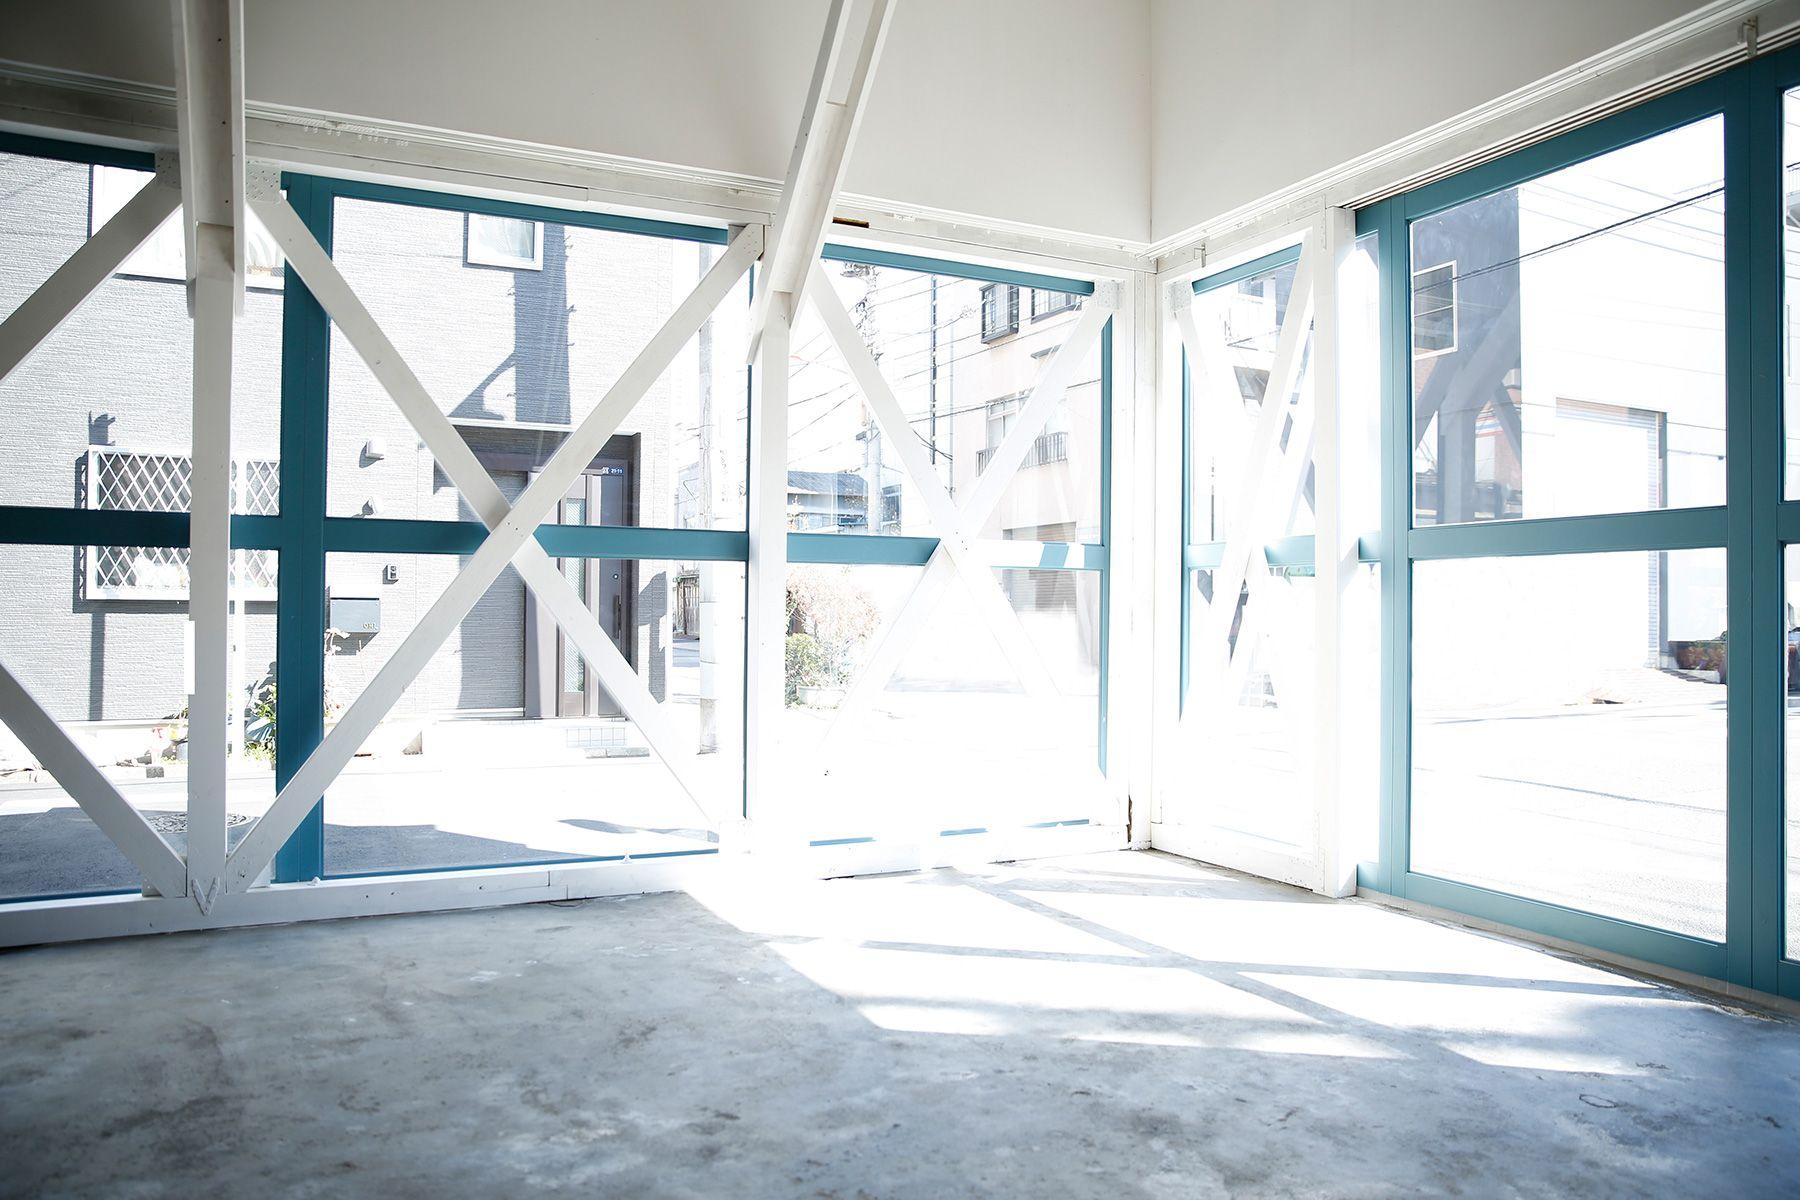 studio PEANUTS (スタジオ ピーナッツ)2F/光が美しいシンプルな空間